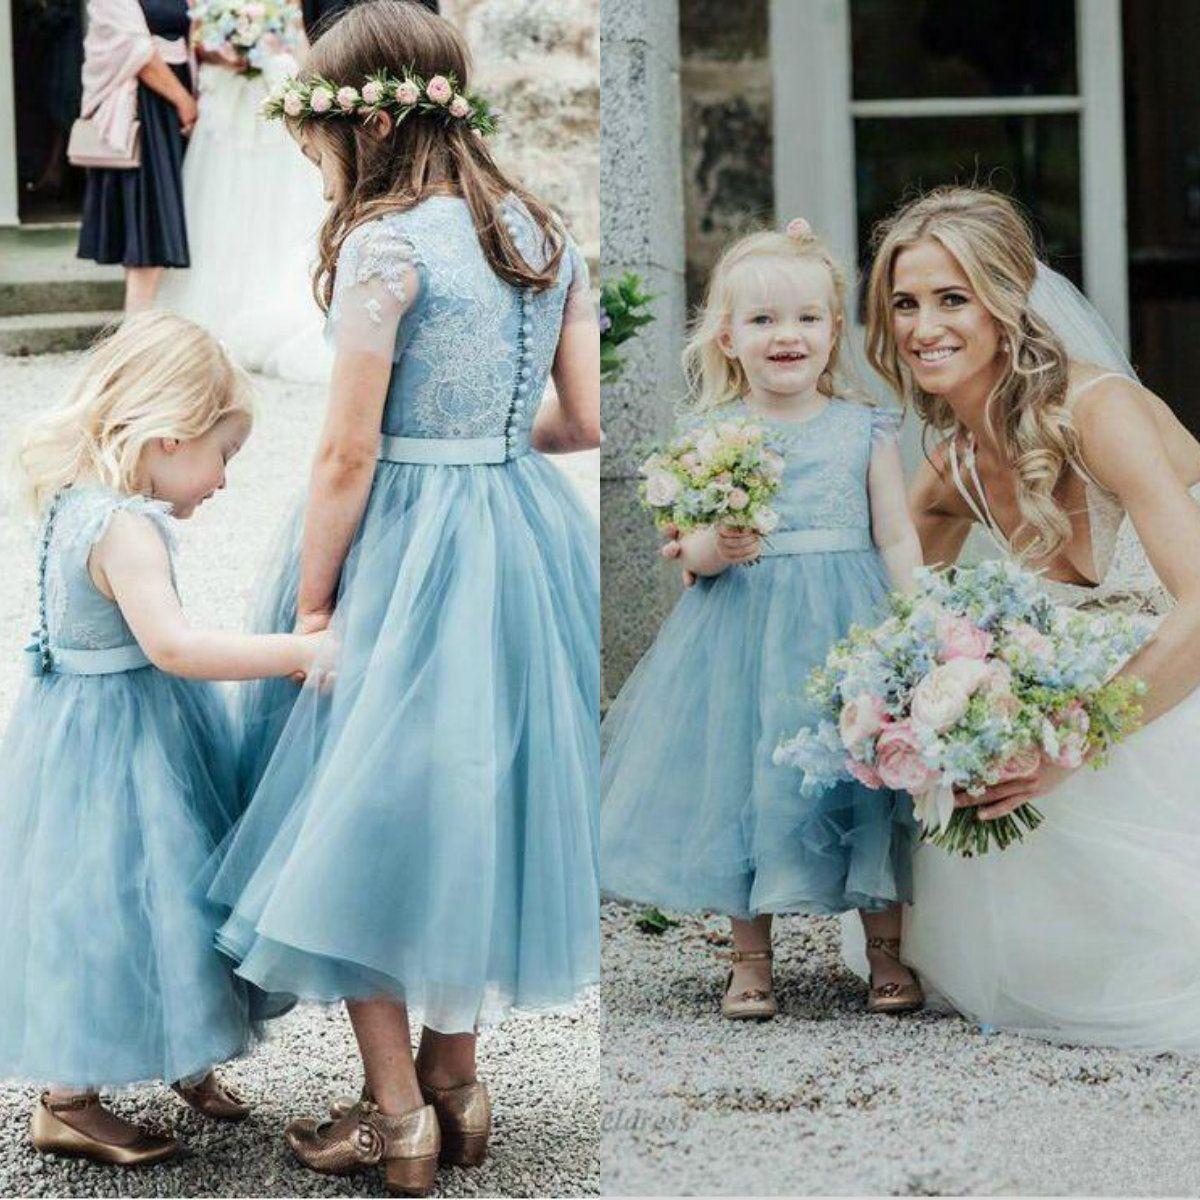 f03c2ed8284 Dusty Blue Flower Girl Dresses For Weddings Lace Cap Sleeves Tea Length  Buttons Back Tulle Girls First Communion Dress Flowergirl Dress Flowers  Girl Dresses ...